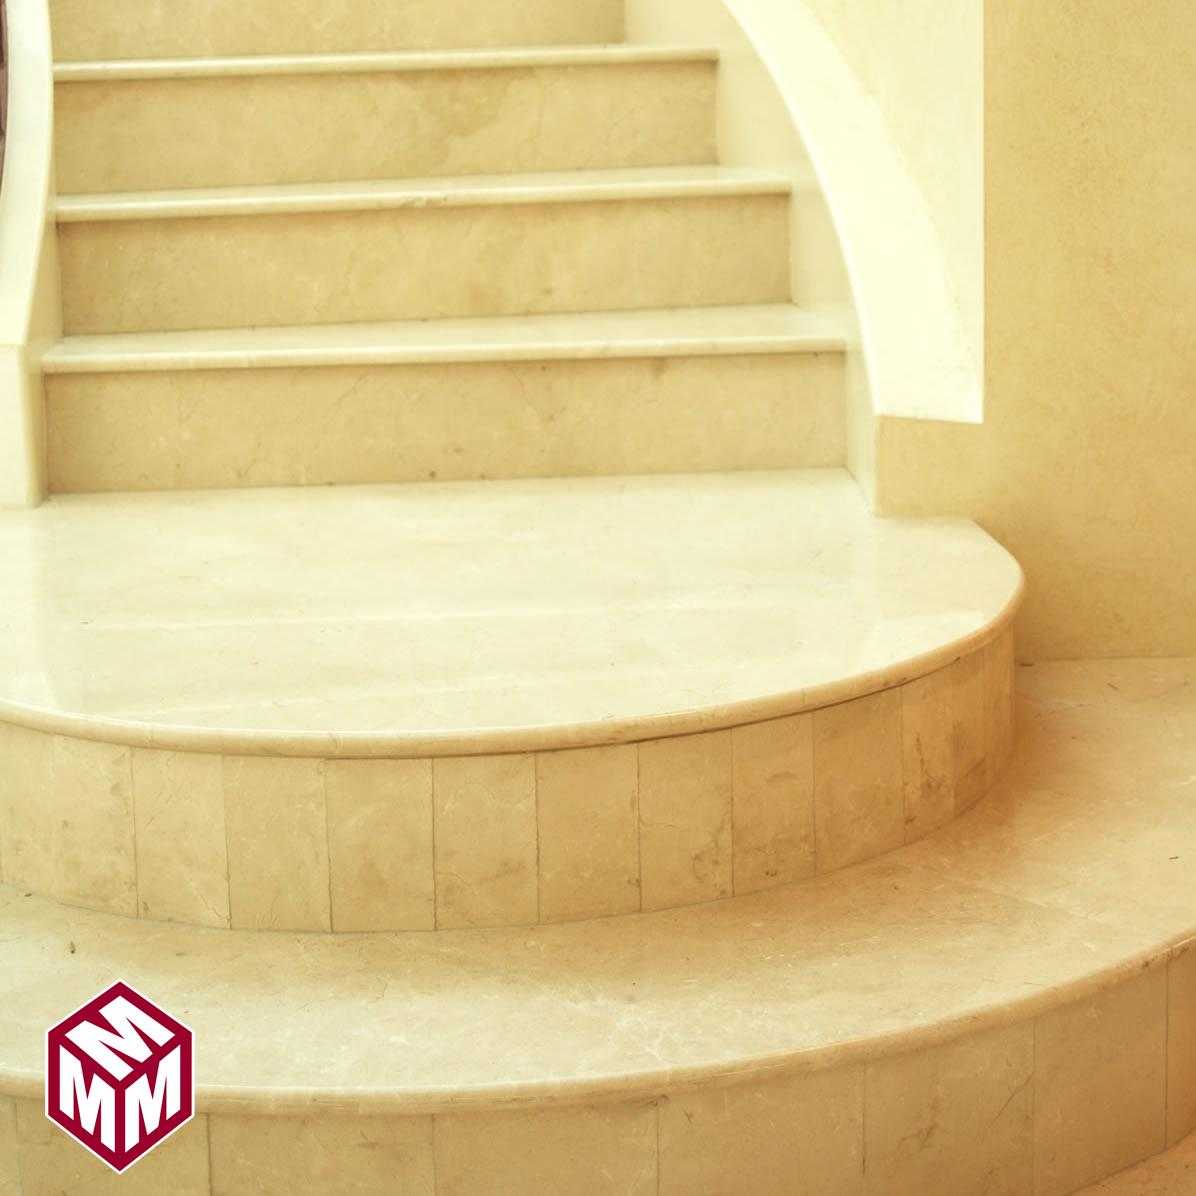 Design services for marble, granite, tile, stone